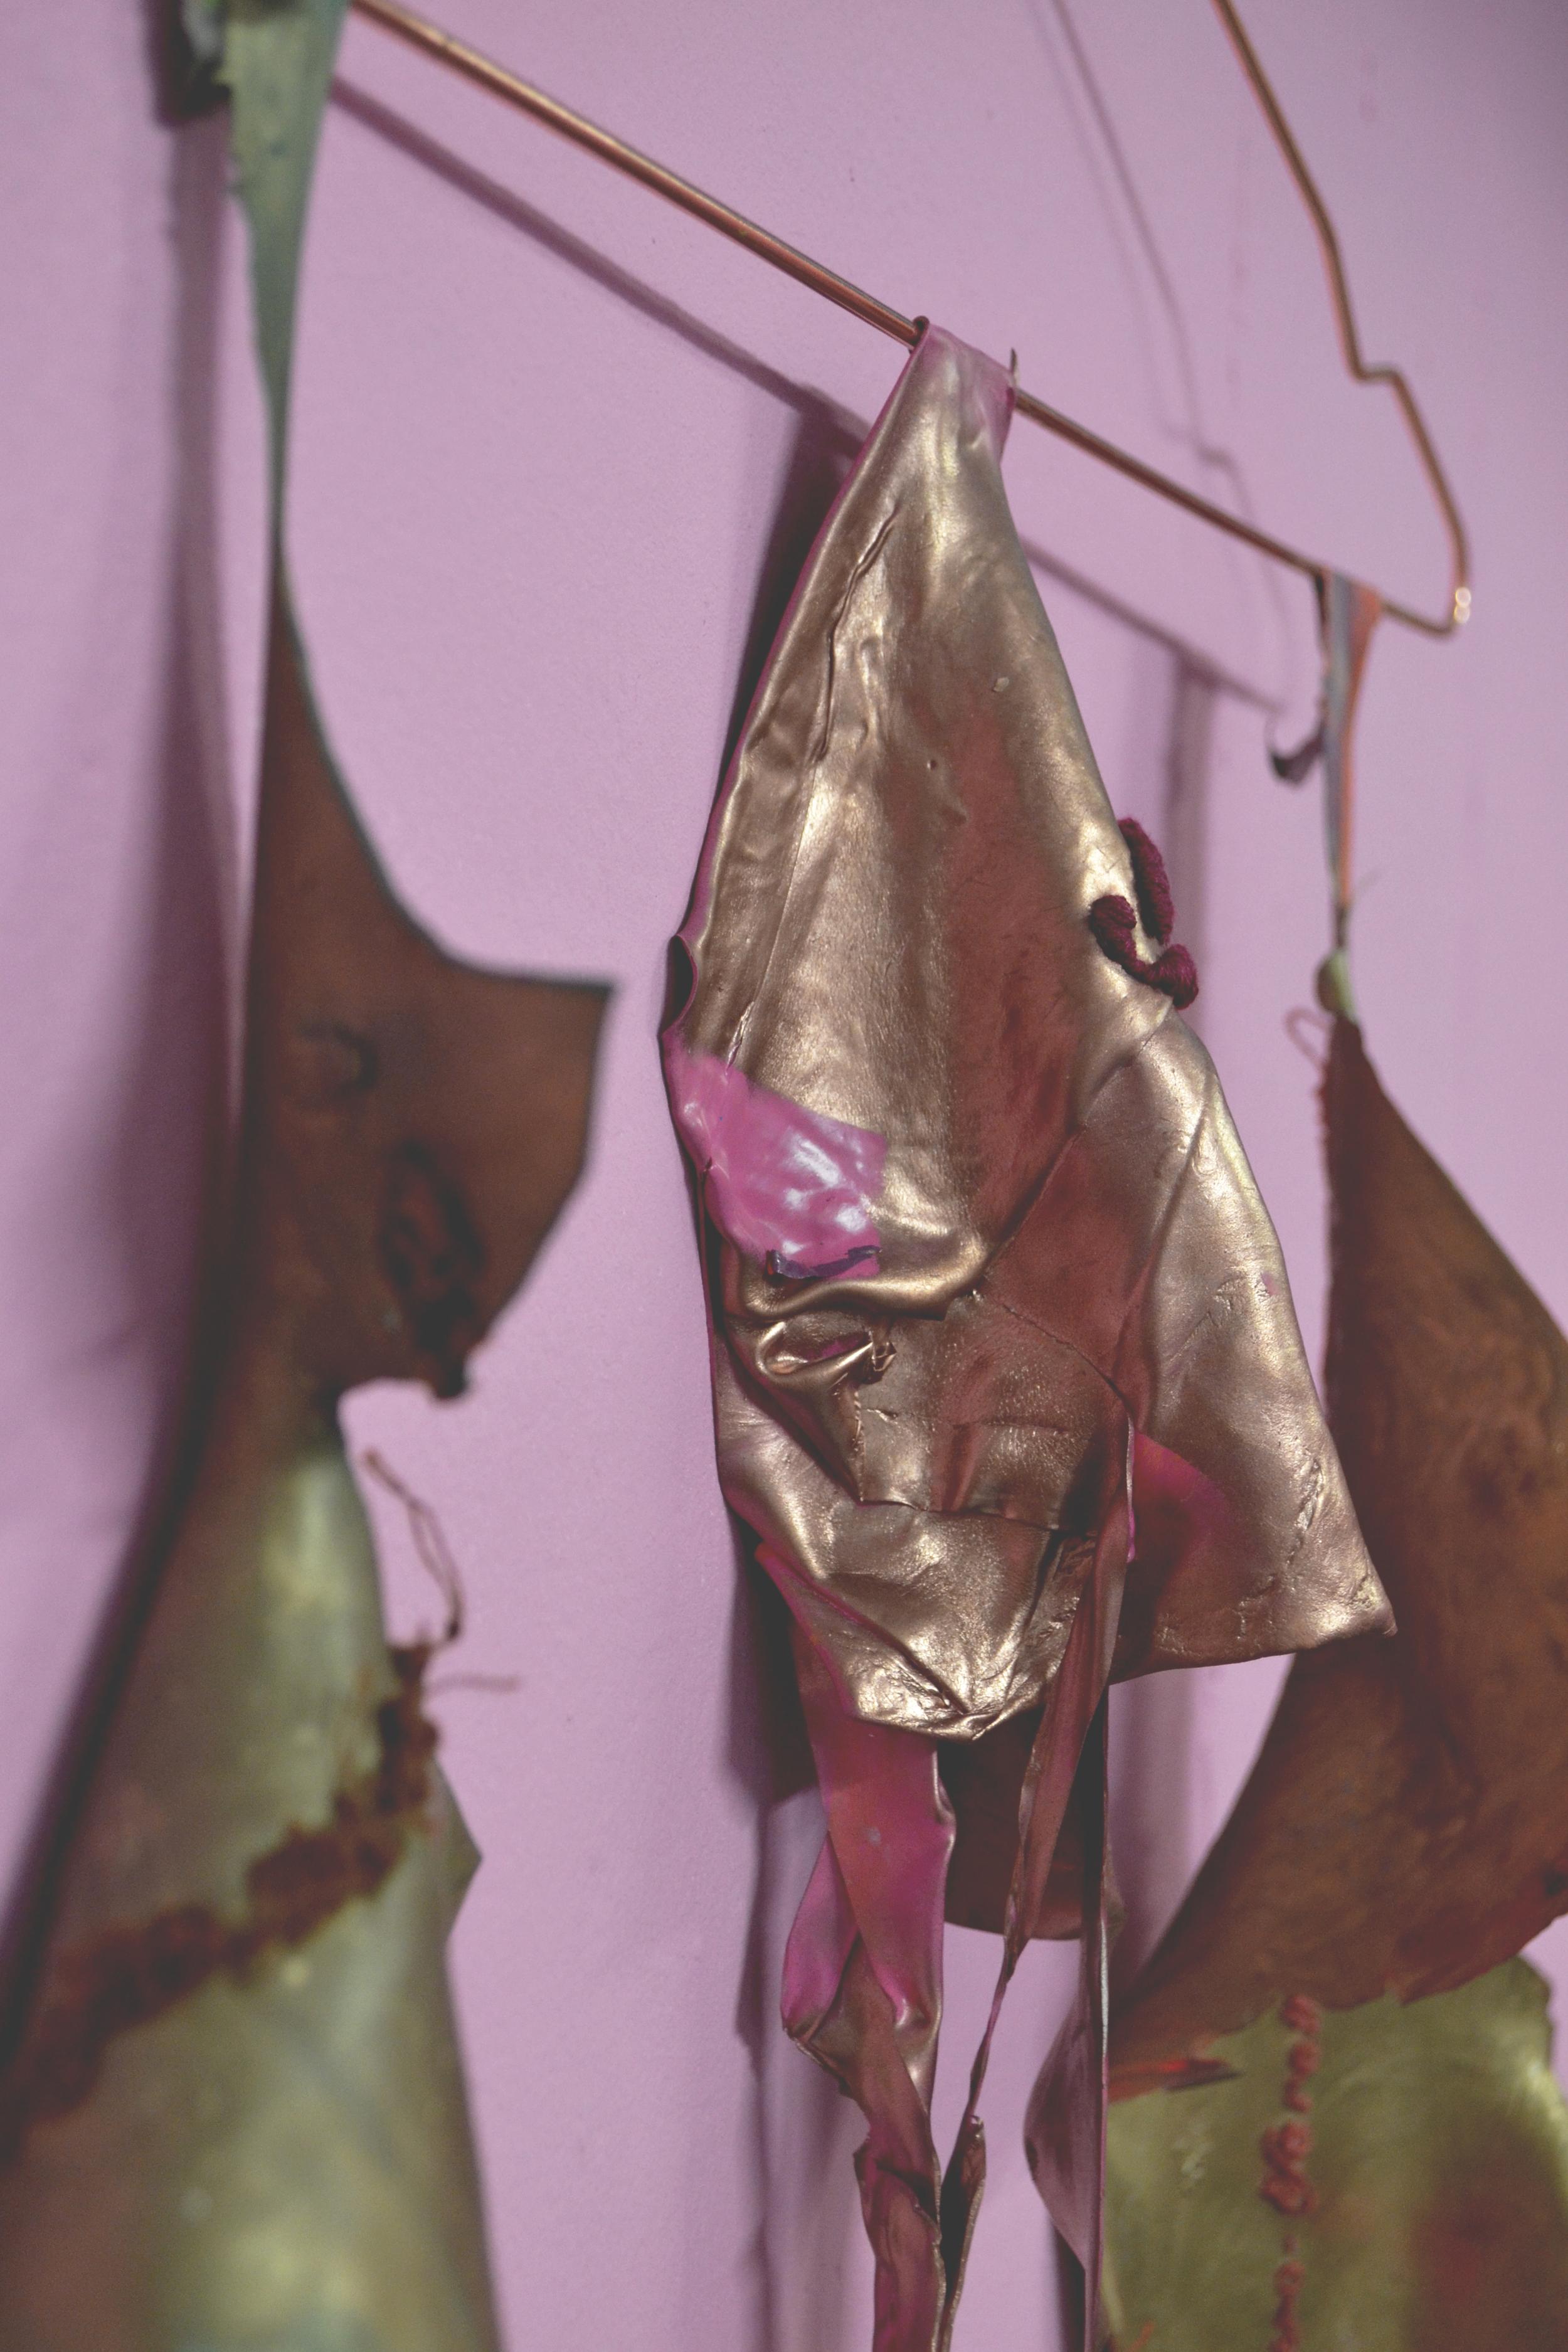 Hanger Abortions